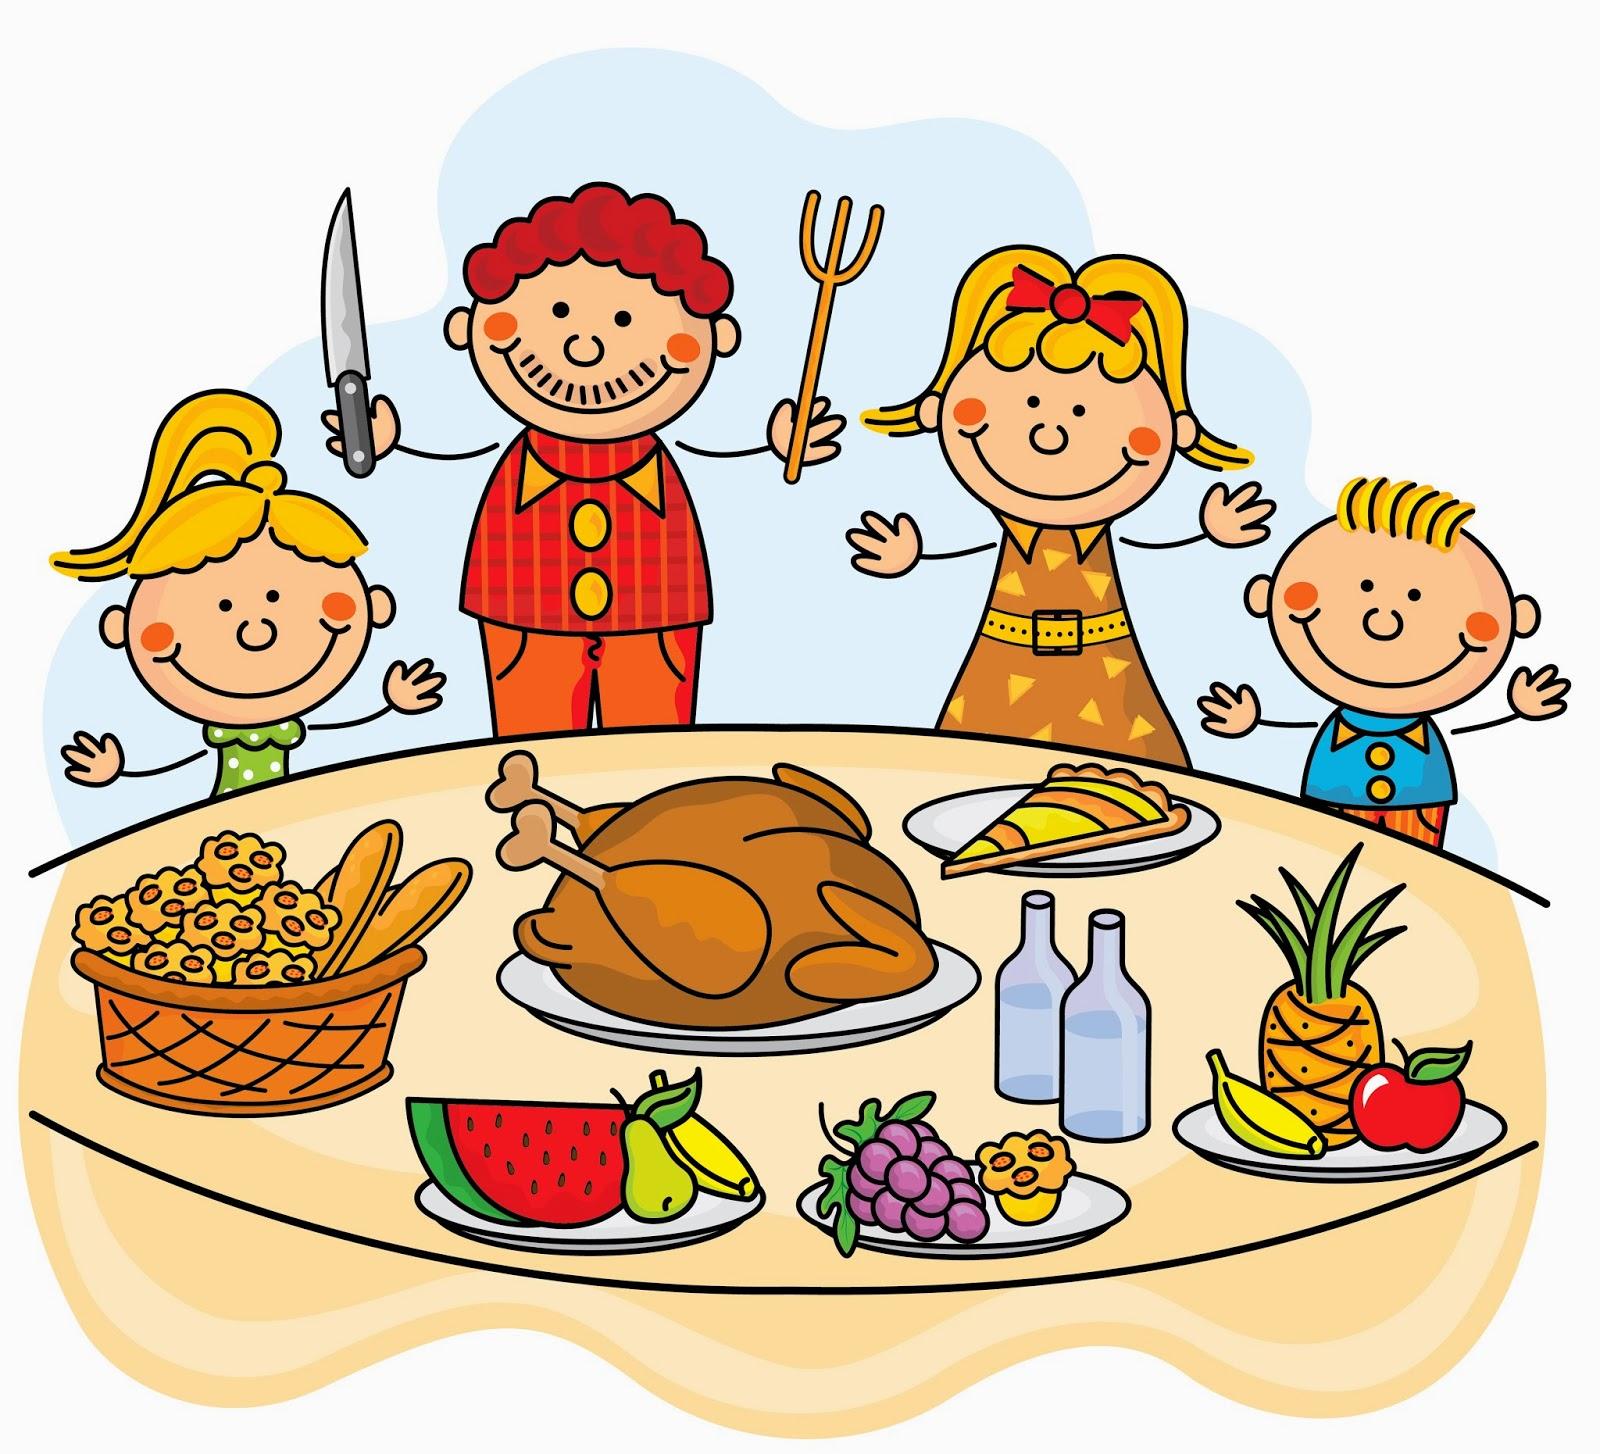 1600x1454 Family Celebration December Clipart, Explore Pictures